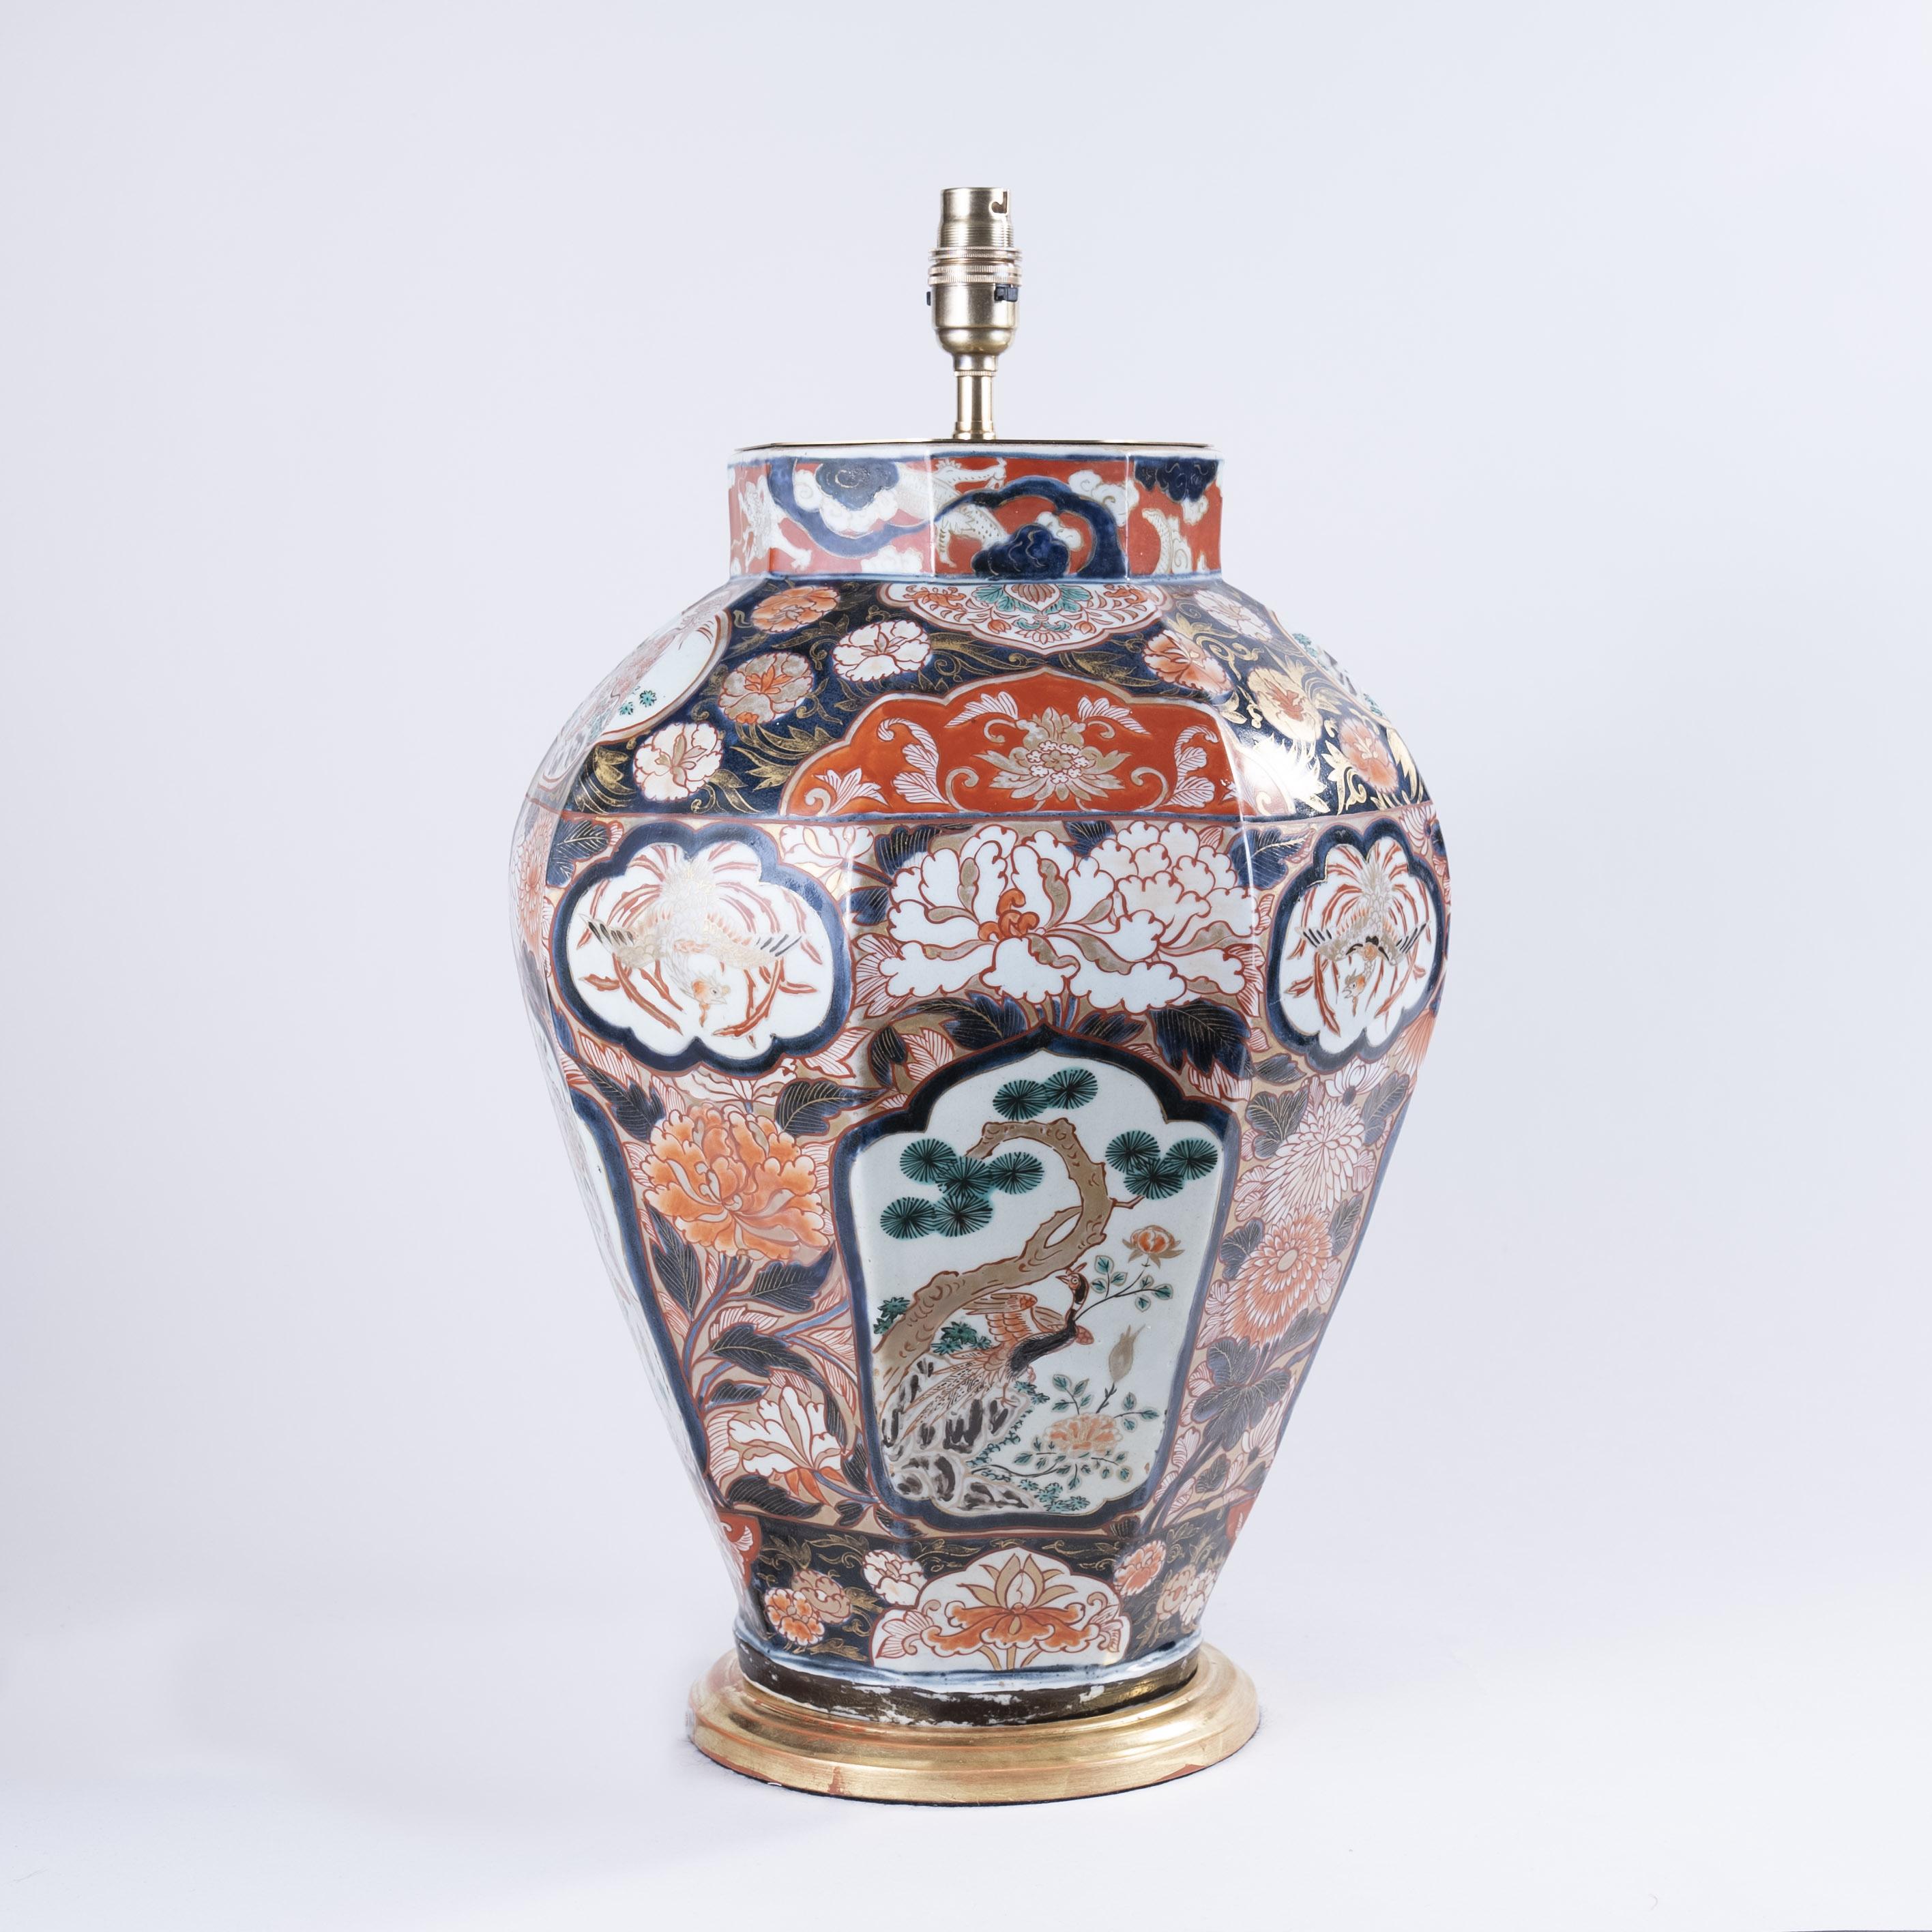 Early 18th Century Japanese Imari Octagonal Vase as a Lamp